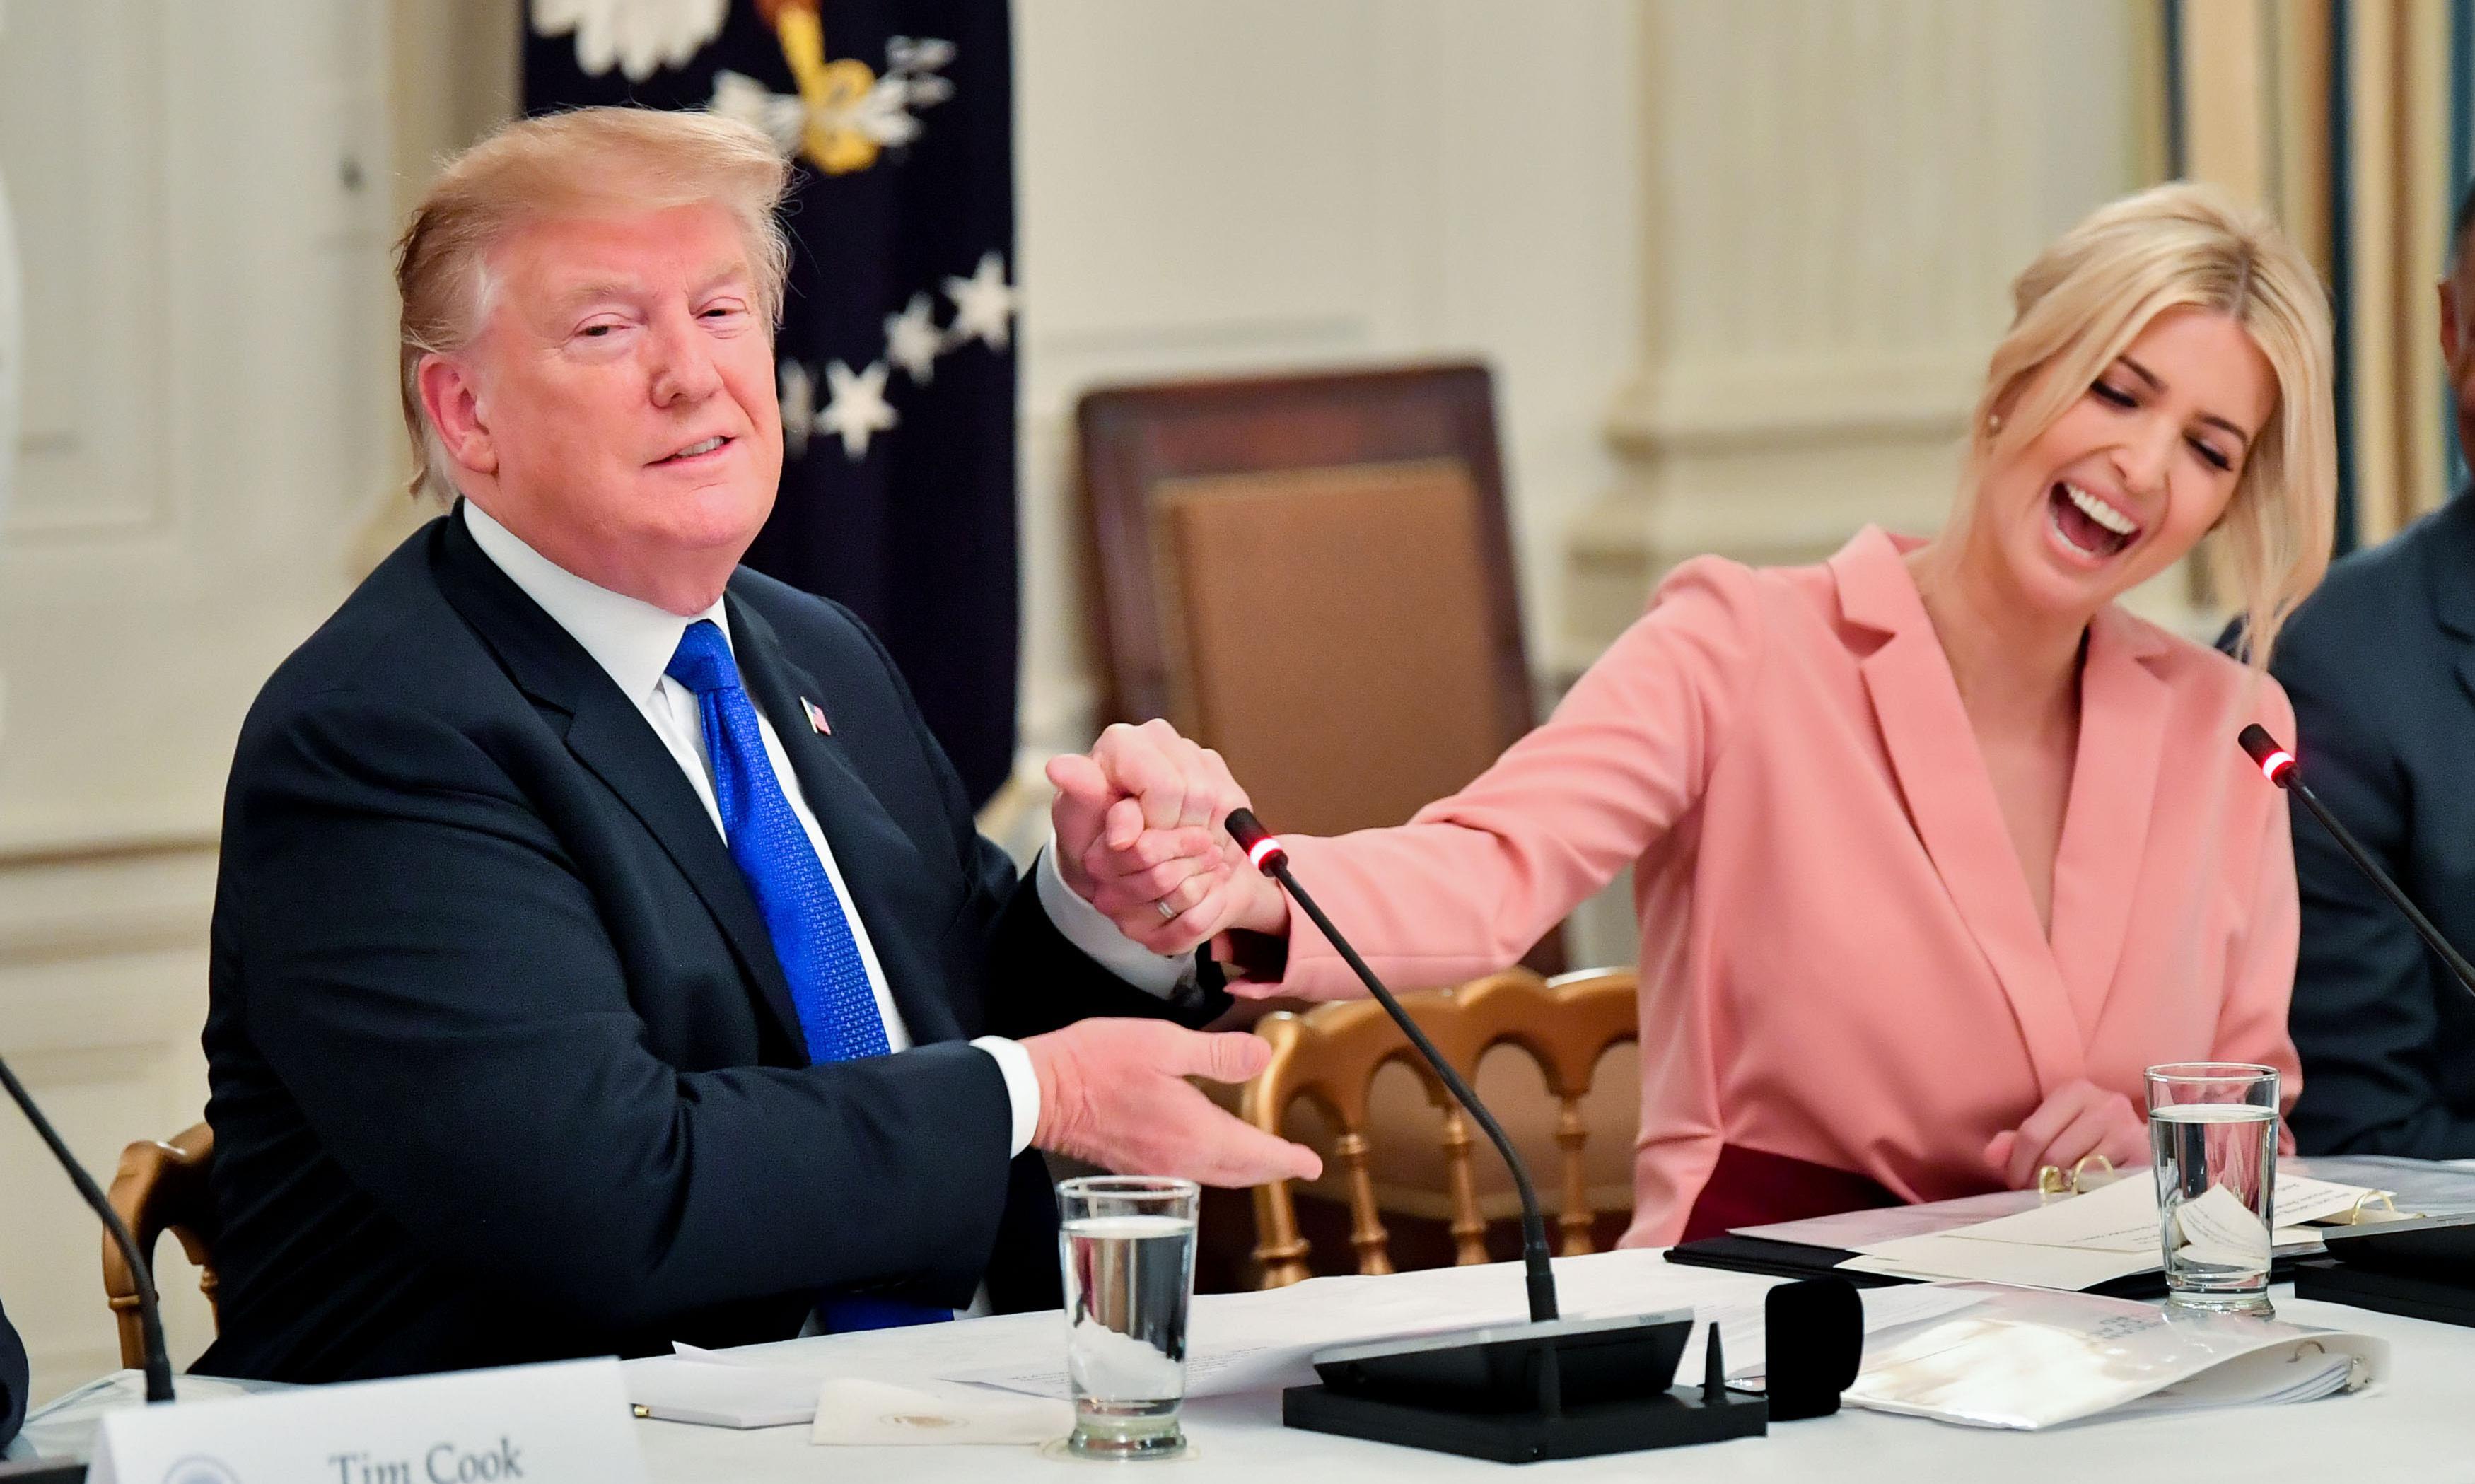 Ivanka Trump's 2020 tweet violated Hatch Act, watchdog says